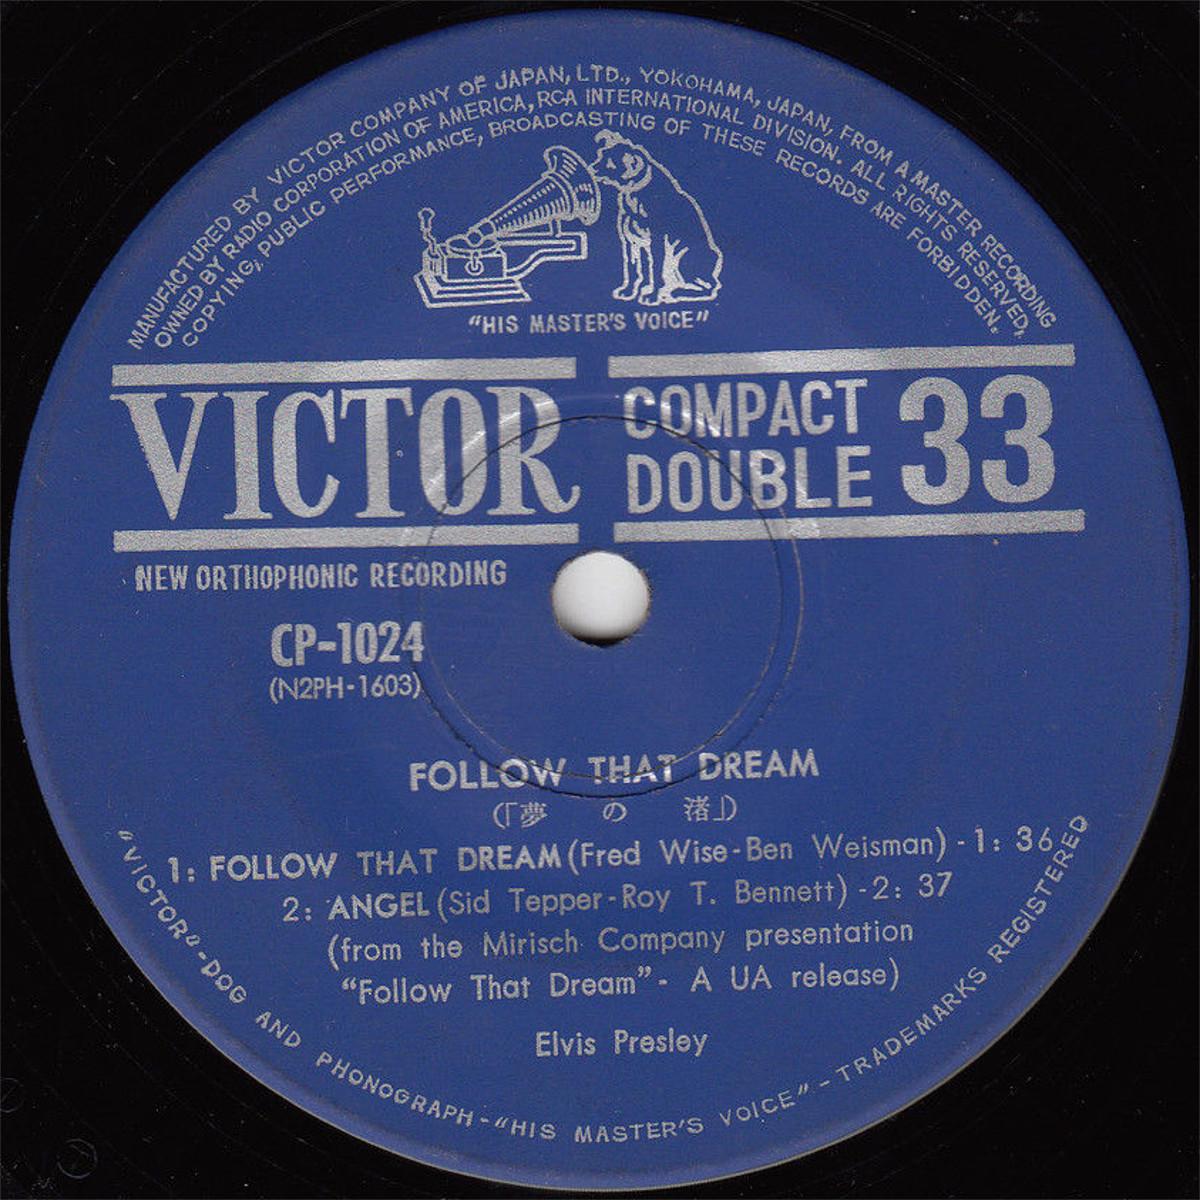 FOLLOW THAT DREAM Cp-1024e2zdgj